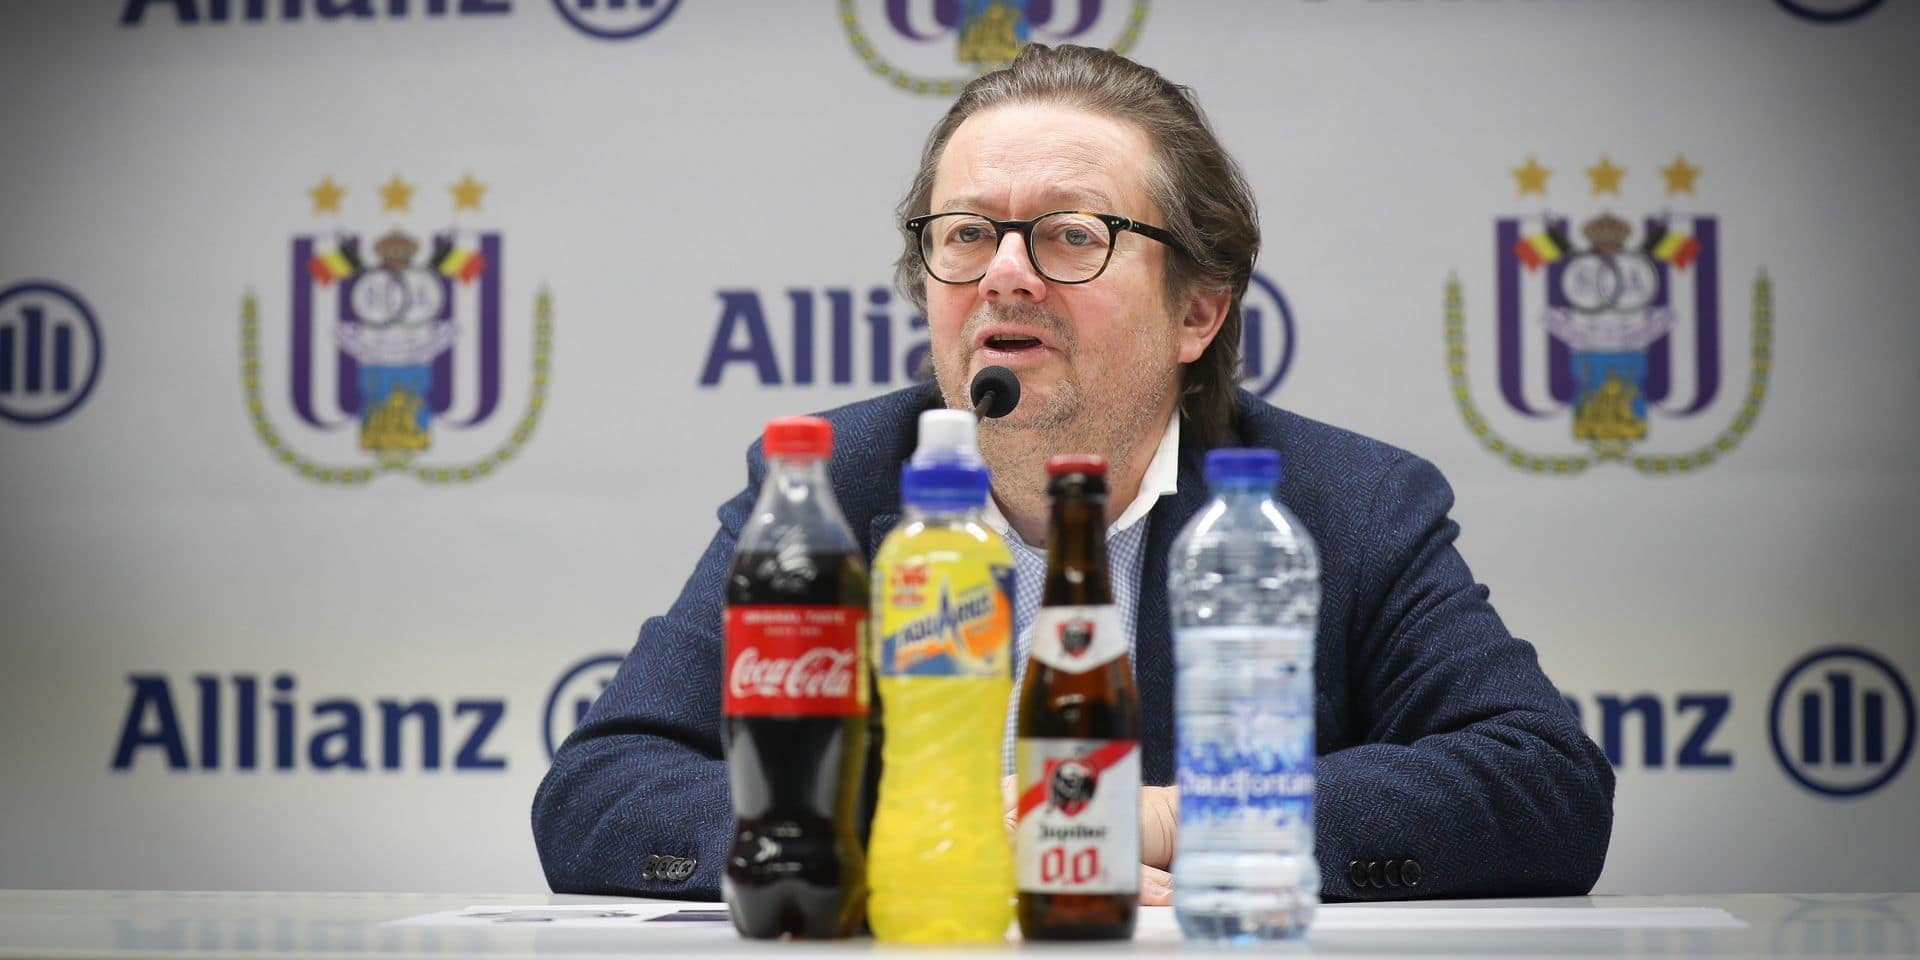 Allianz stoppe son sponsoring du Sporting d'Anderlecht